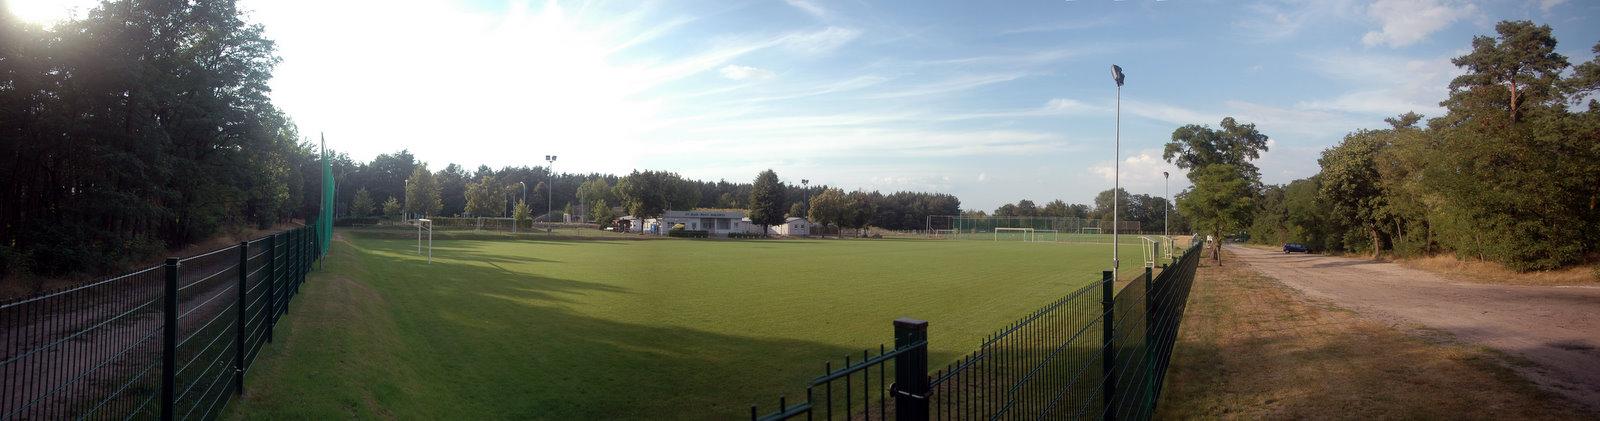 2009-08-06 Sportplatz Panorama